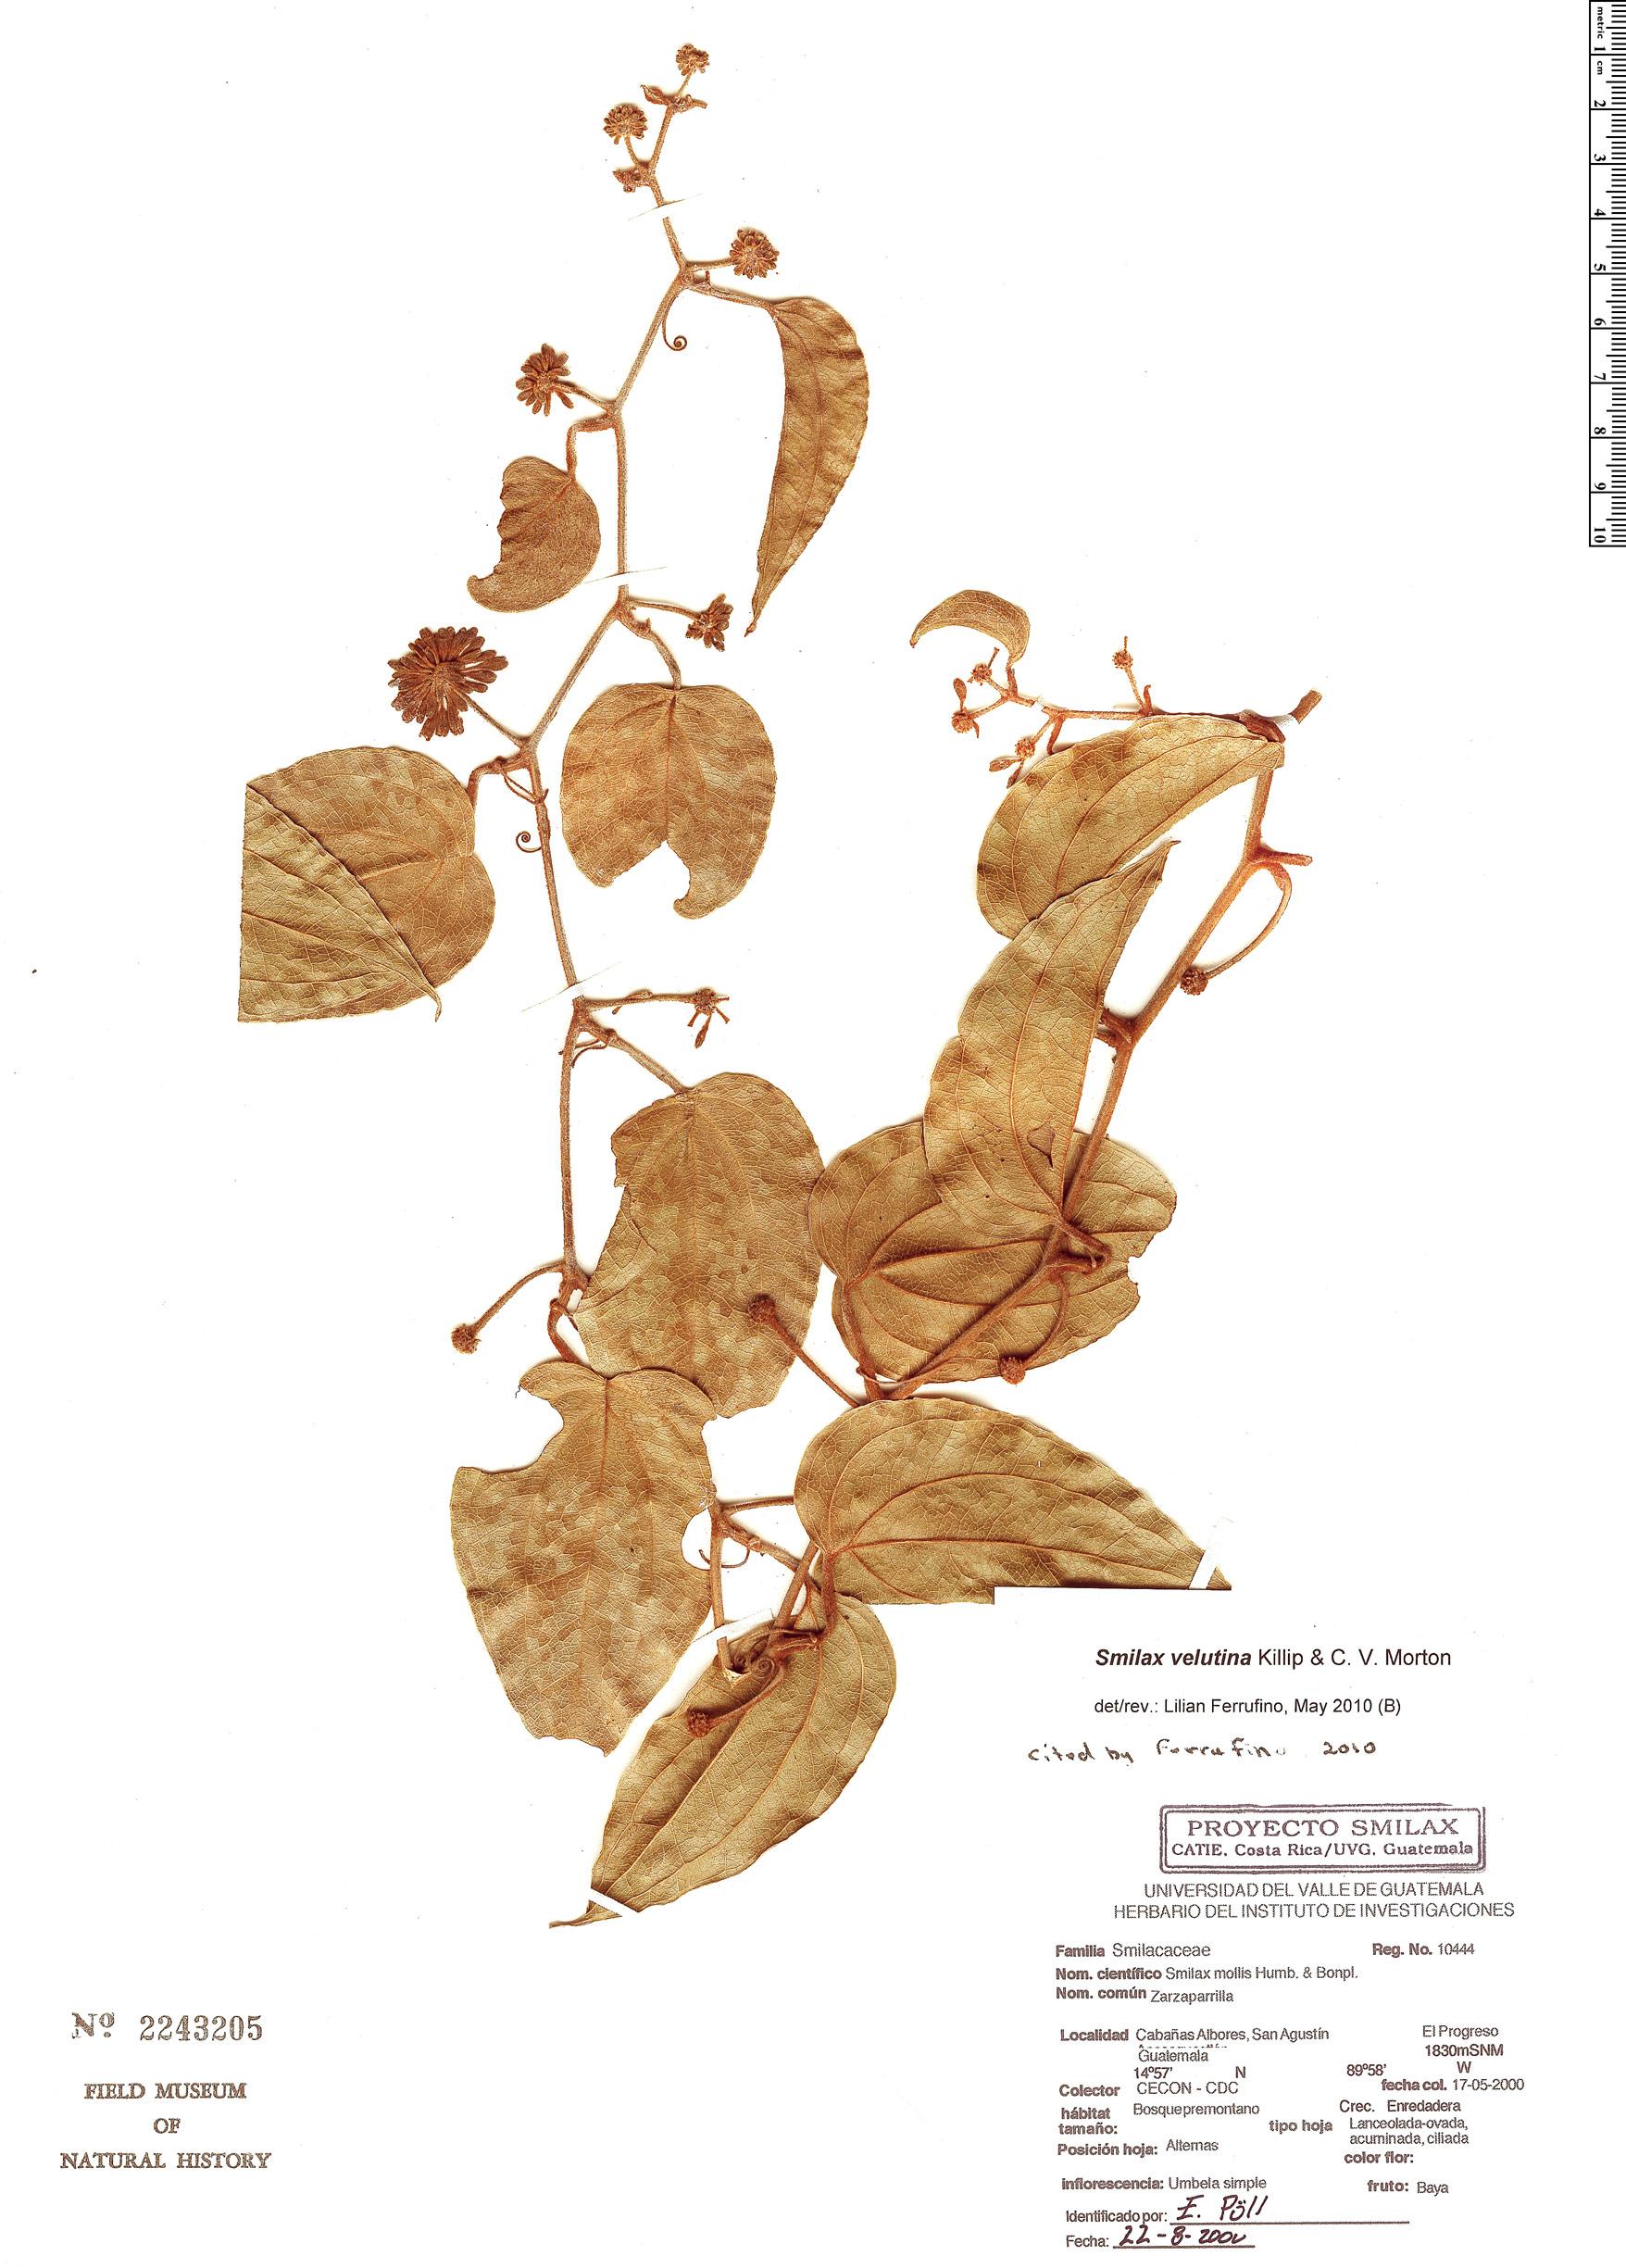 Specimen: Smilax velutina